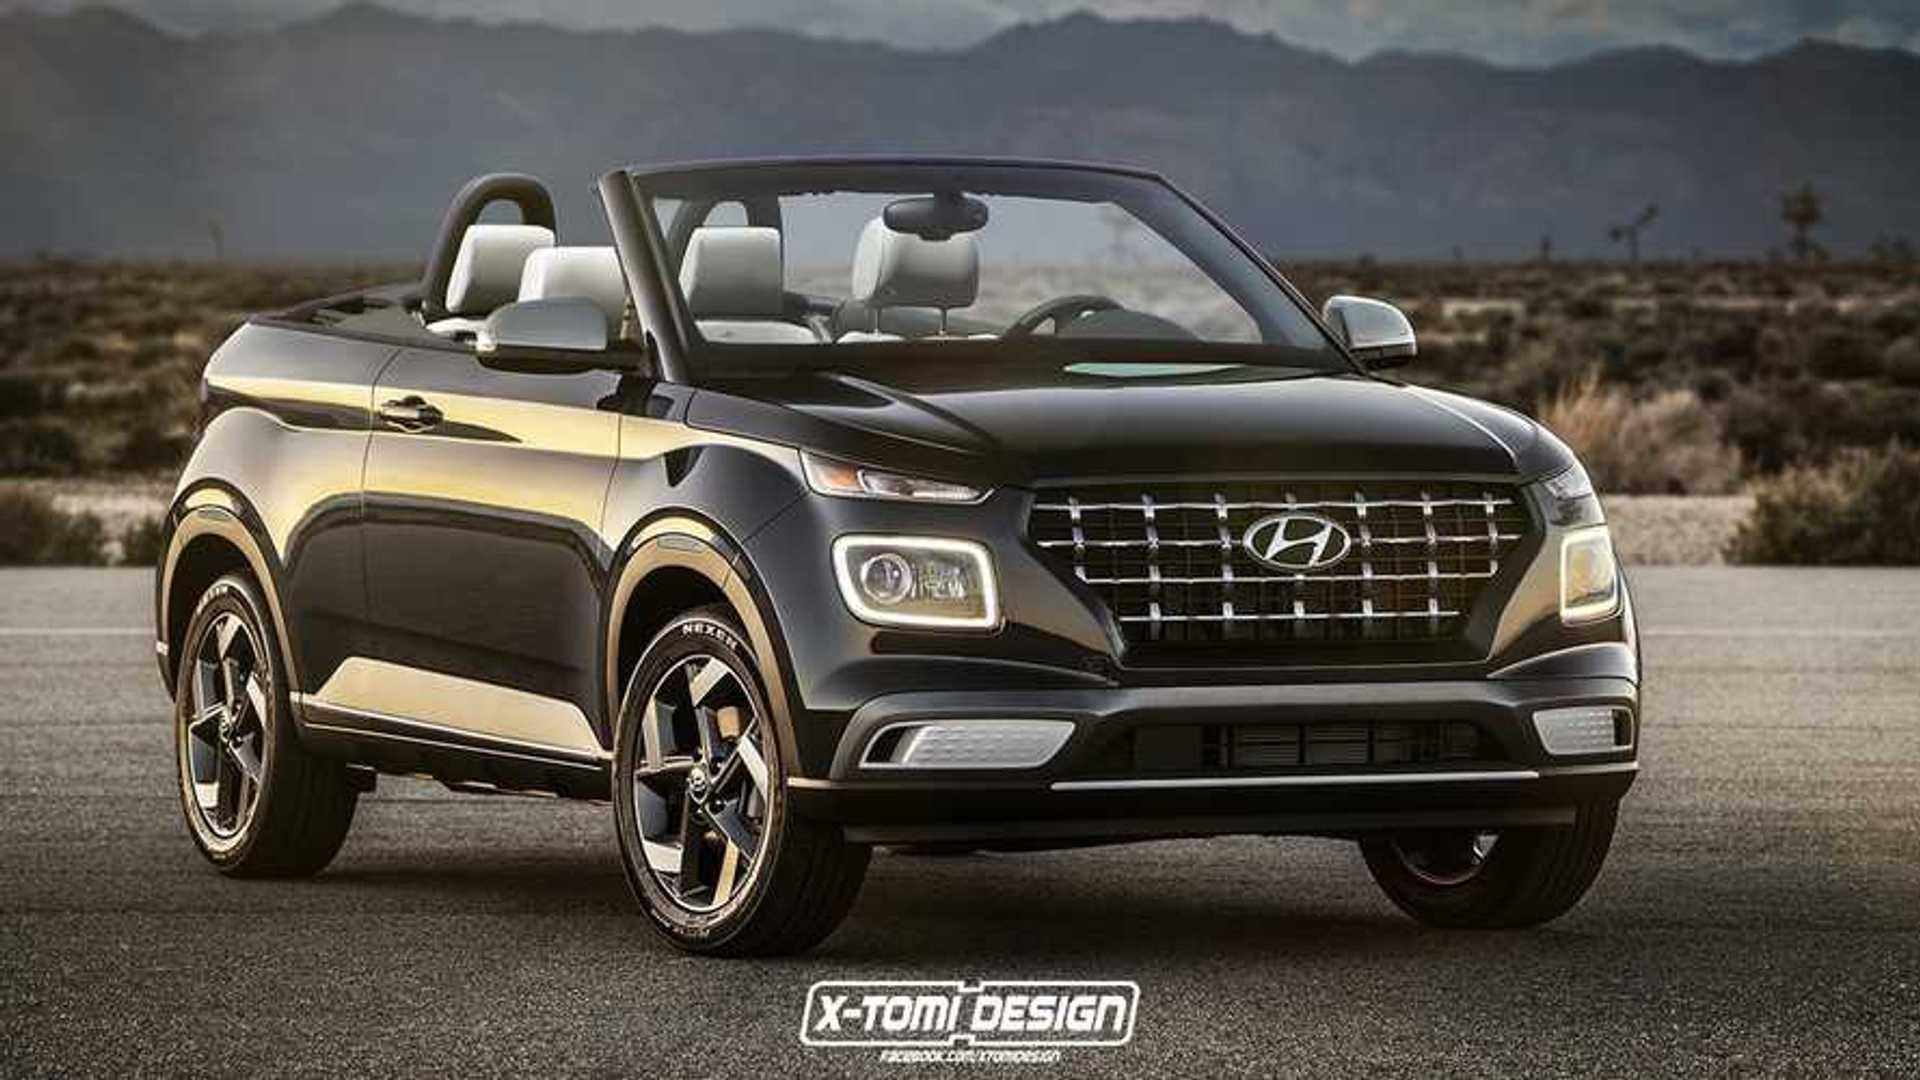 Hopefully Venue Cabrio Render Won T Give Hyundai Any Ideas